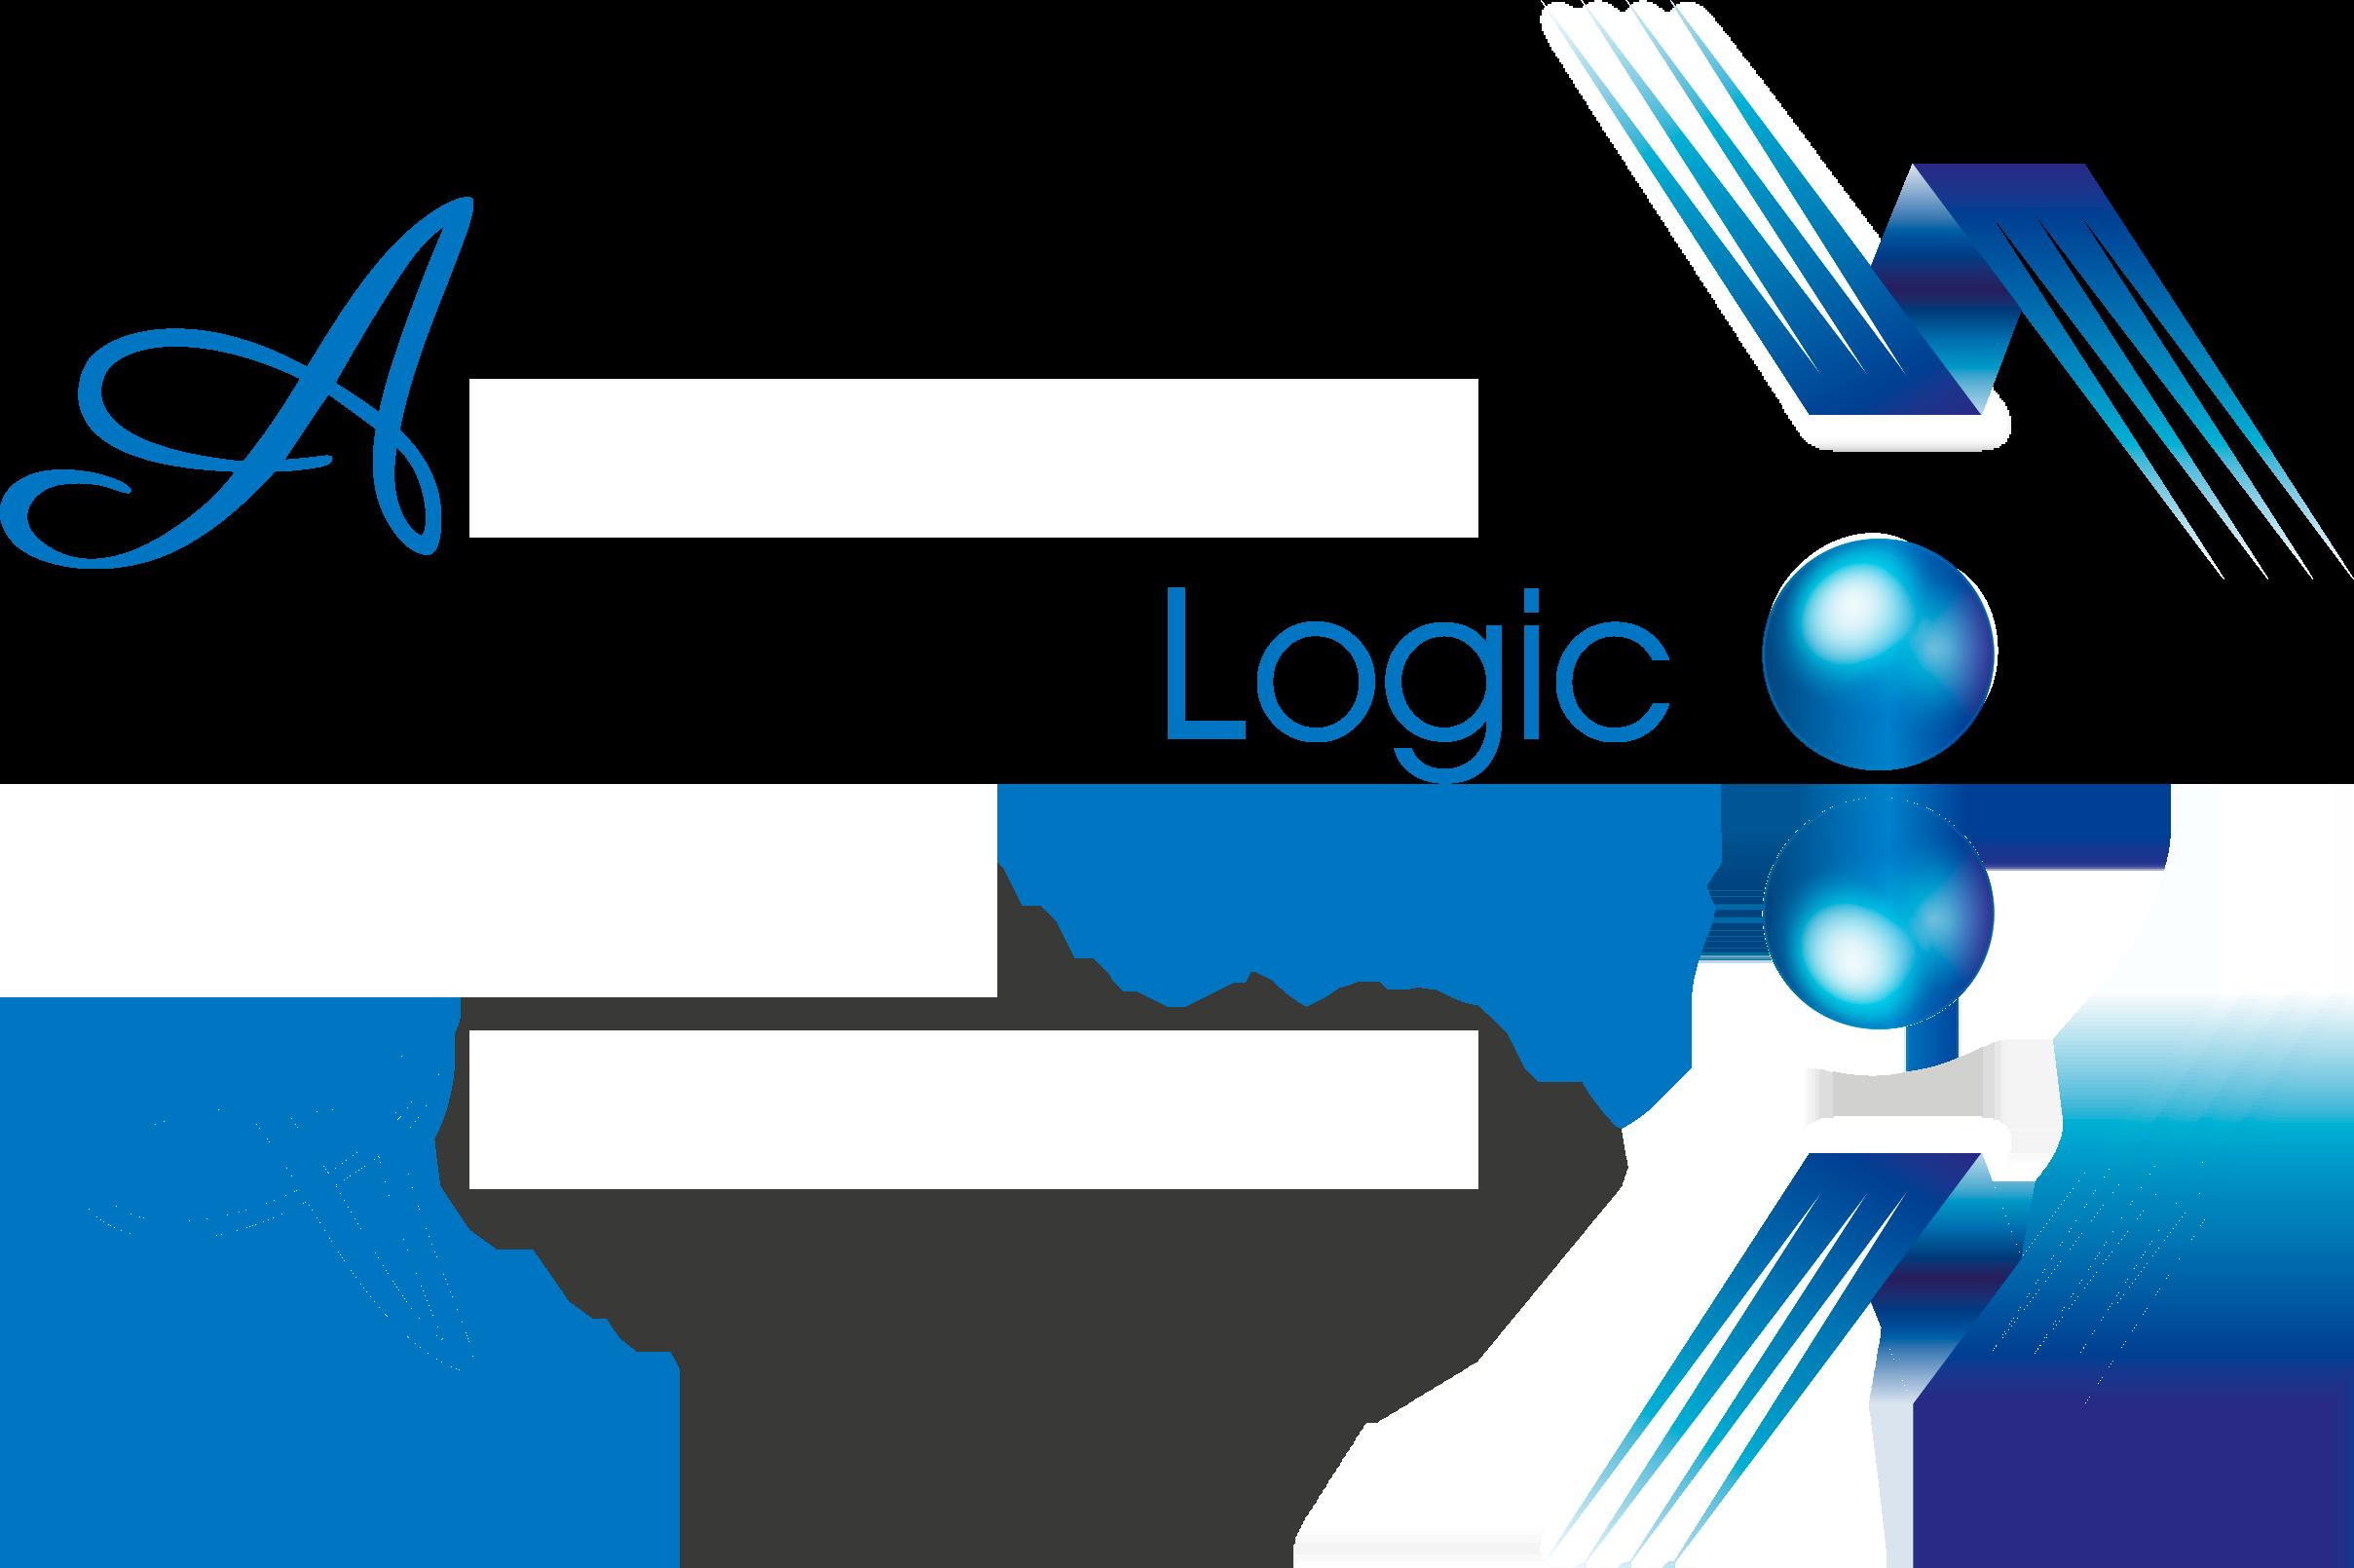 logo-amusement01.png